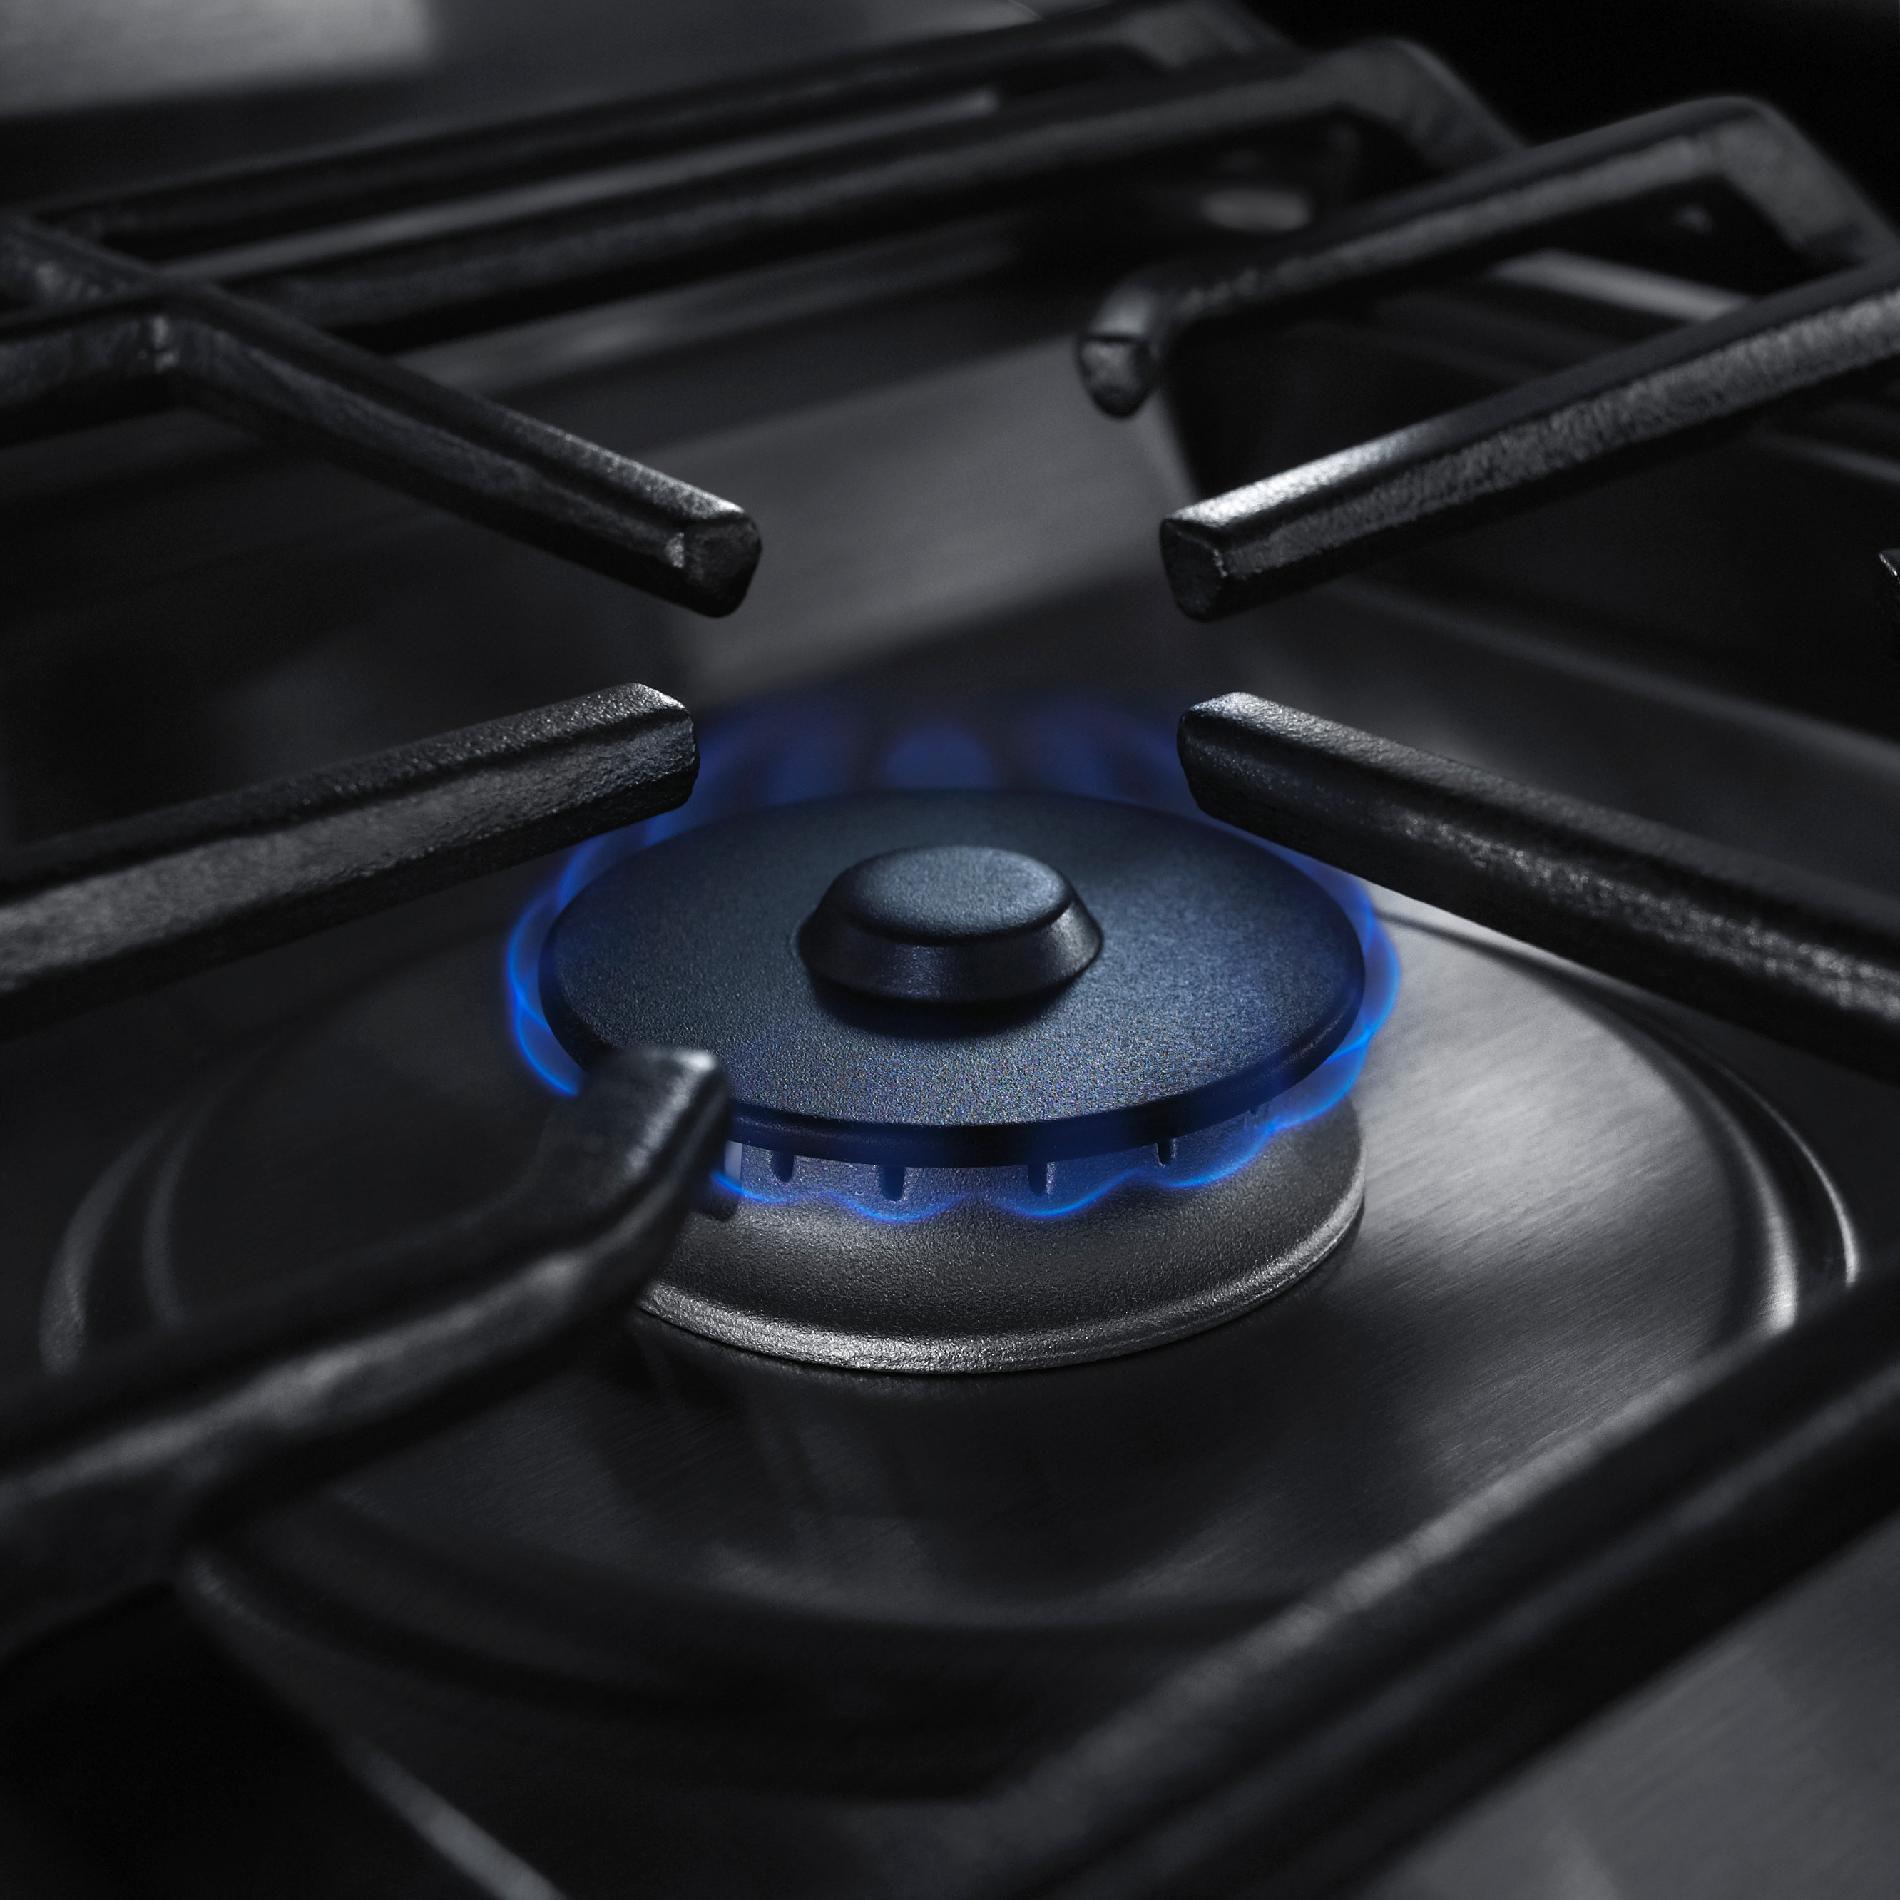 KitchenAid 5.8 cu. ft. Freestanding Gas Range w/ Warming Drawer - Stainless Steel